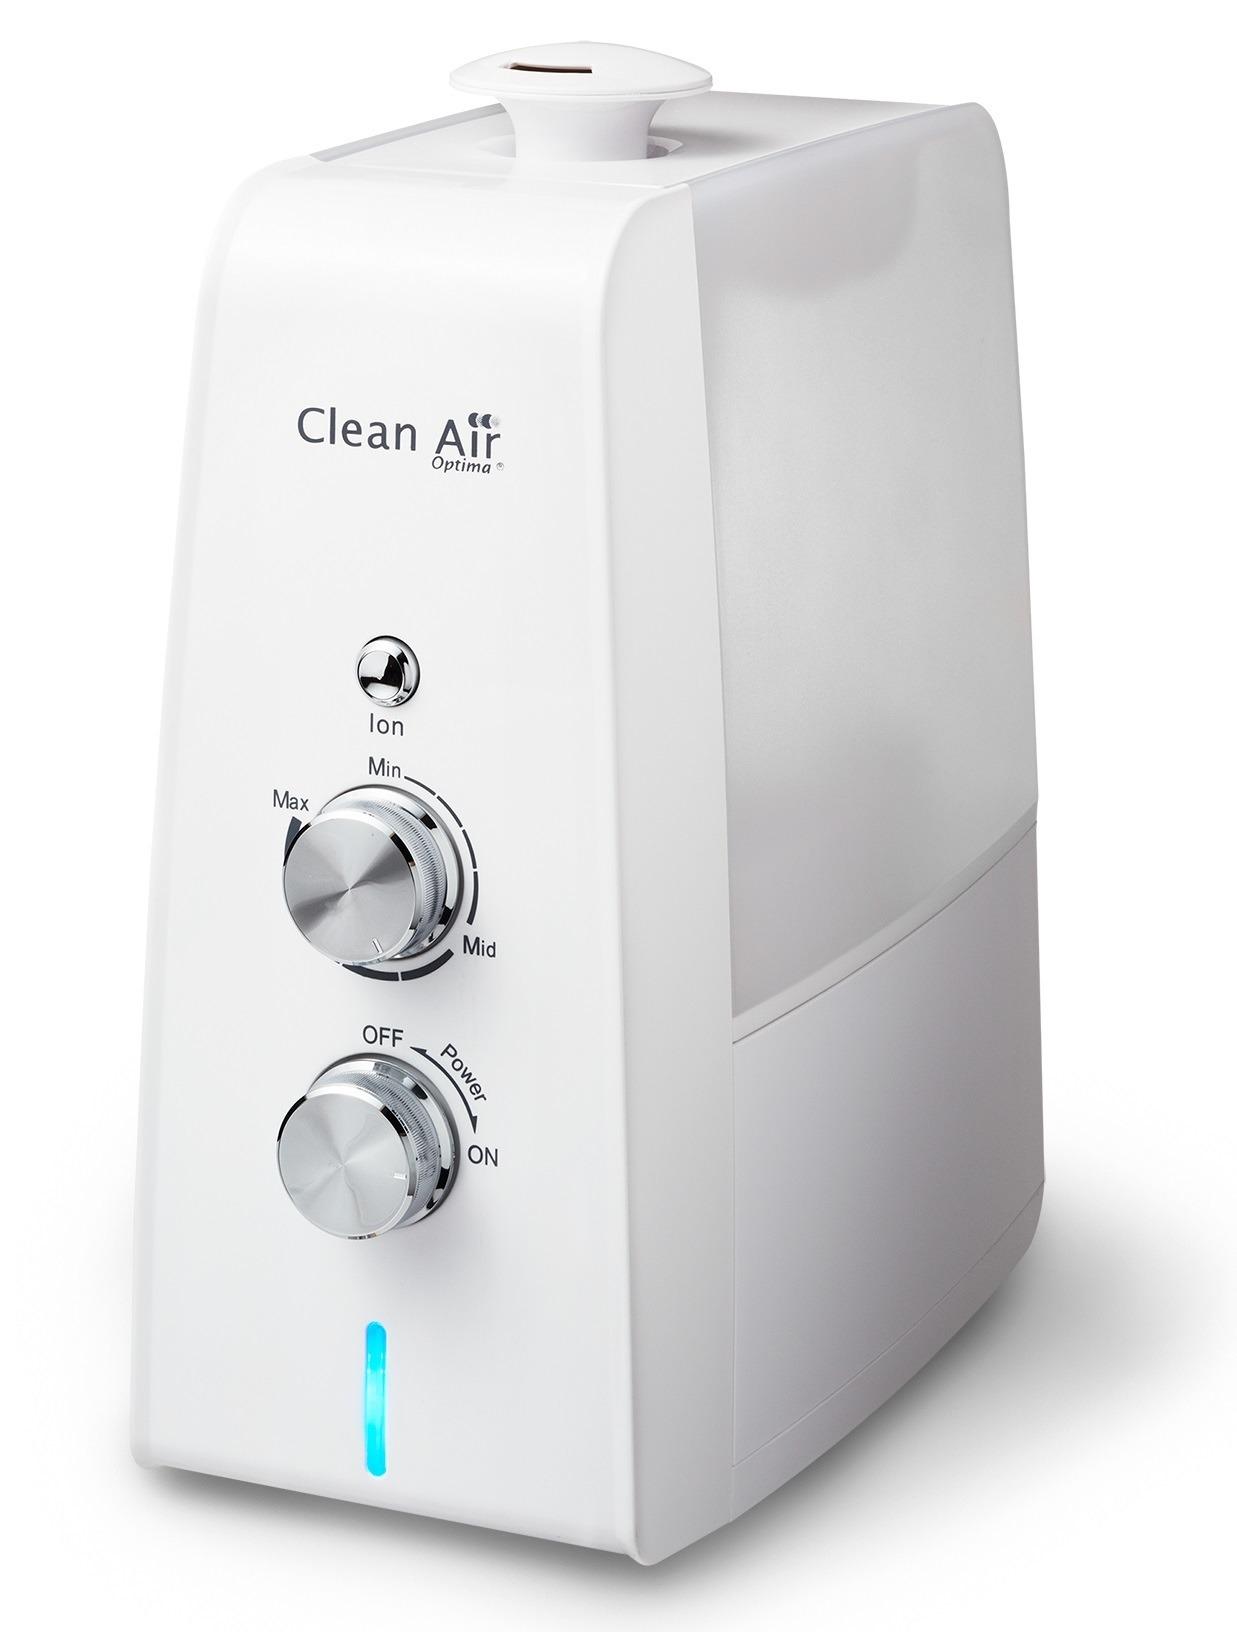 Dagaanbieding - Clean Air Optima luchtbevochtiger CA-602 dagelijkse koopjes